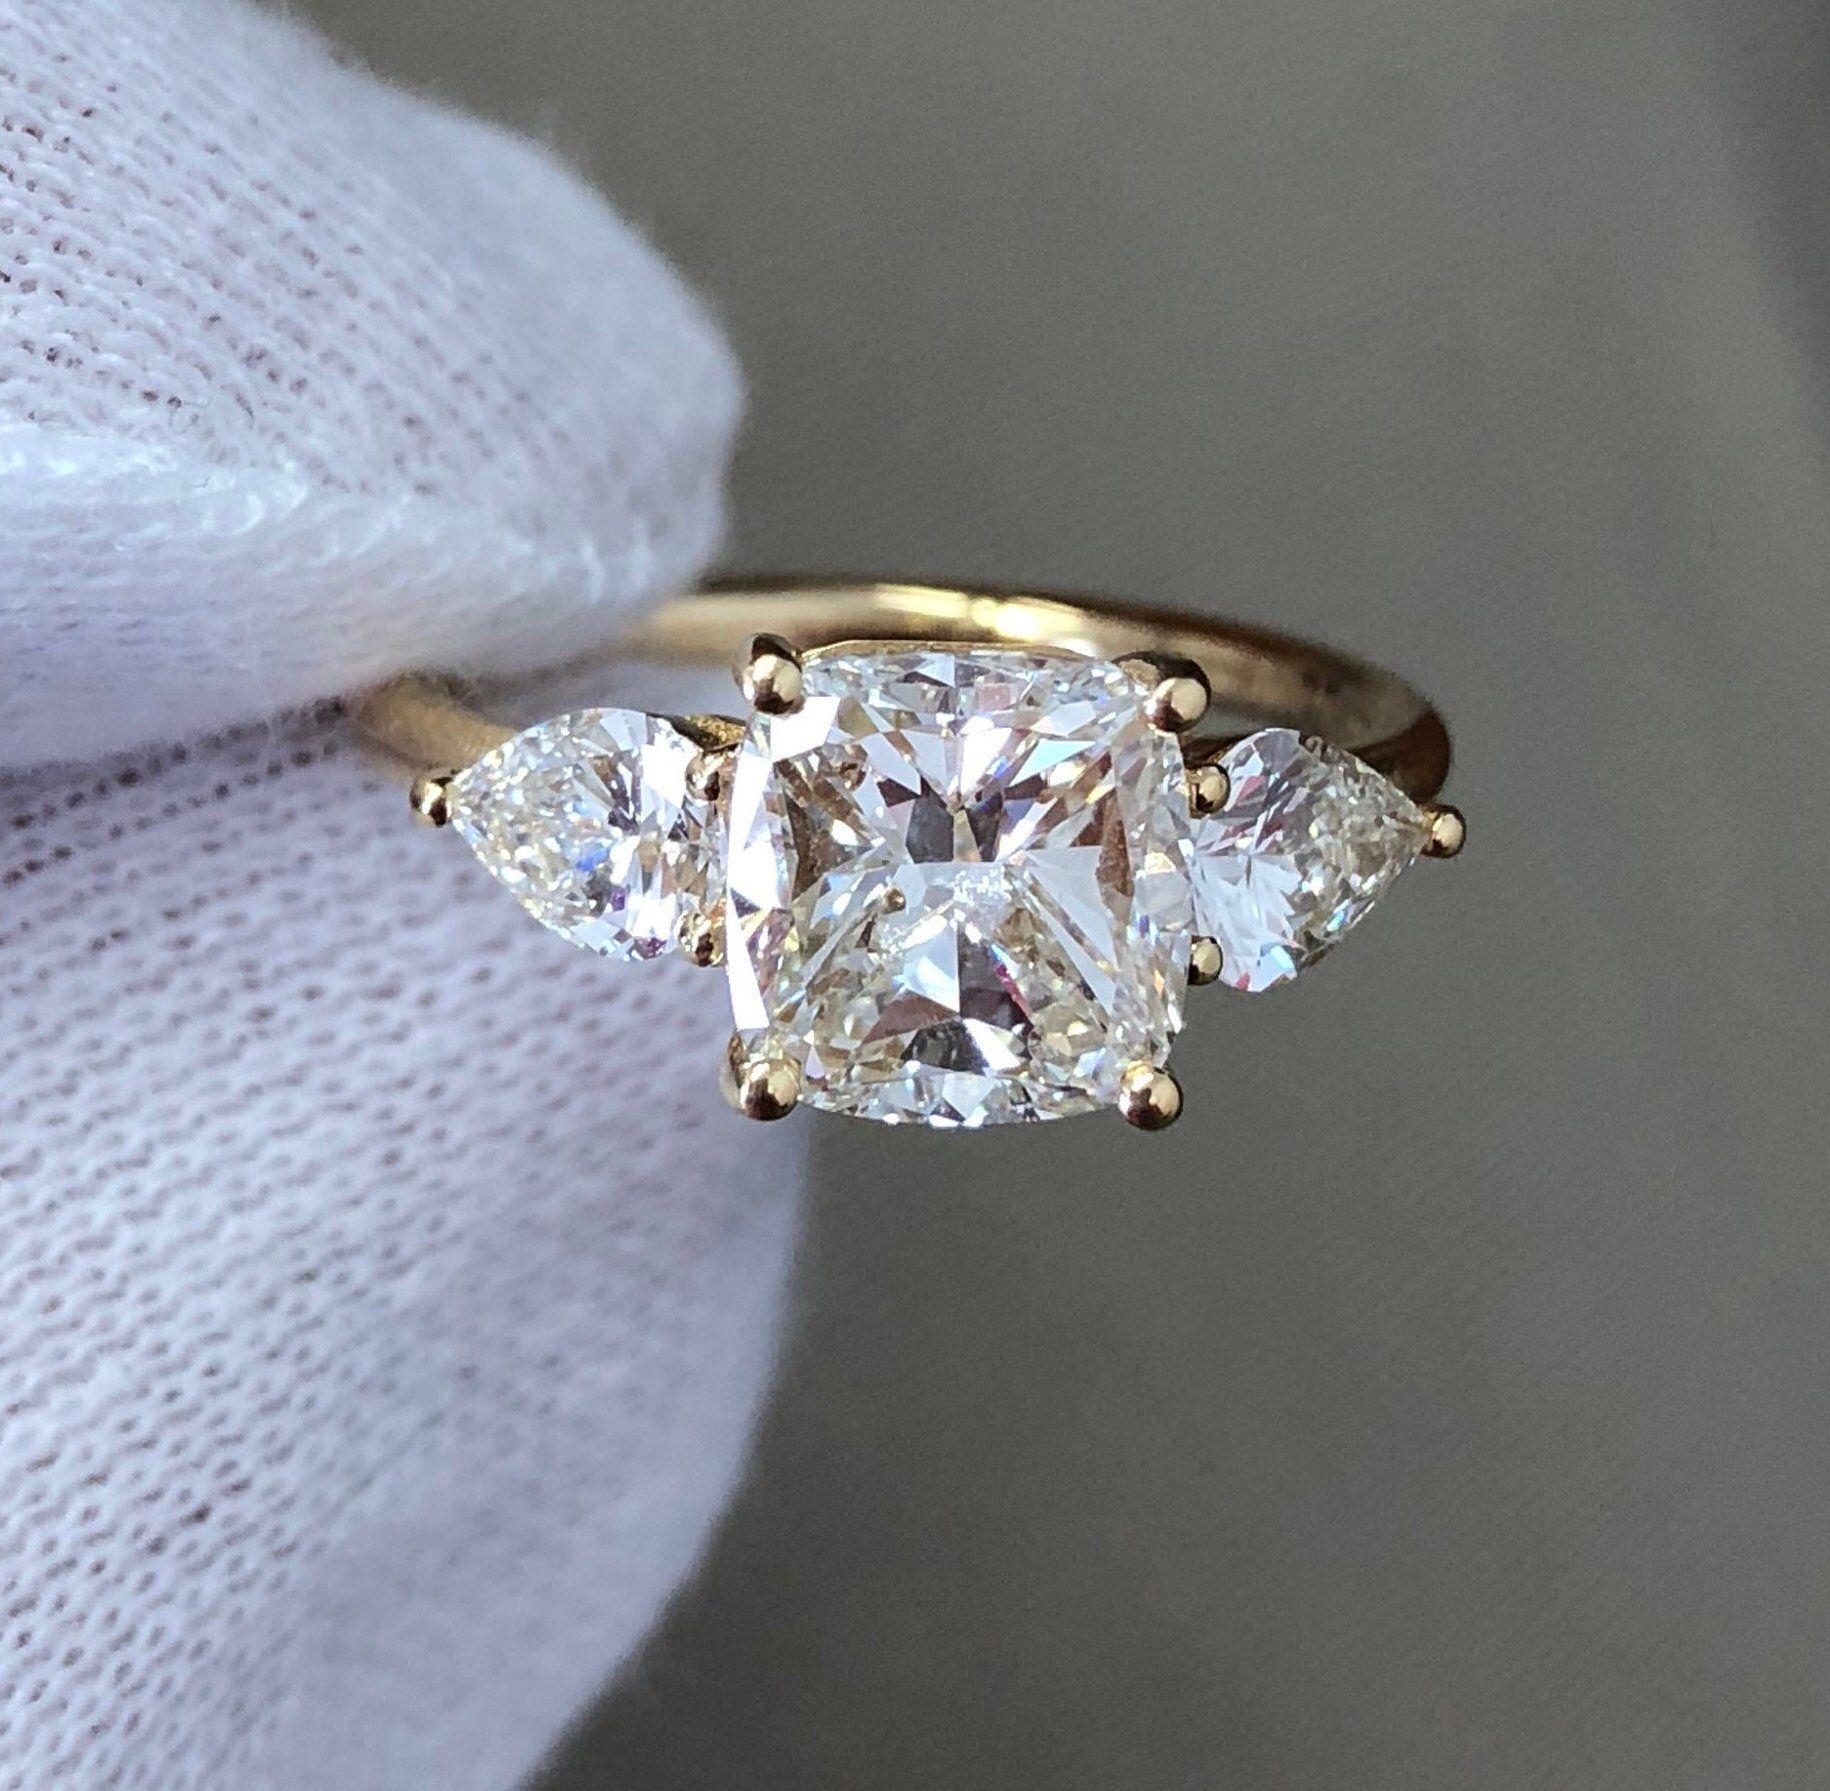 Diamond Engagement Ring, 2.60 Carat Diamond Ring, Cushion Cut with 2 Pear Shape Diamonds, Engagement Ring, 18k Yellow Gold Ring